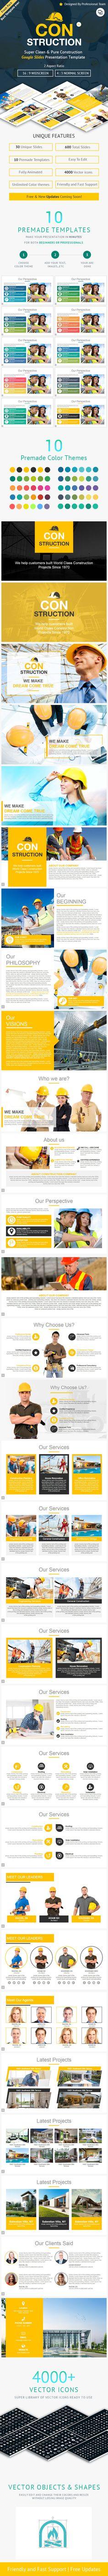 Construction Google Slides Presentation Template. Download here: https://graphicriver.net/item/construction-google-slides-presentation-template/17178458?ref=ksioks